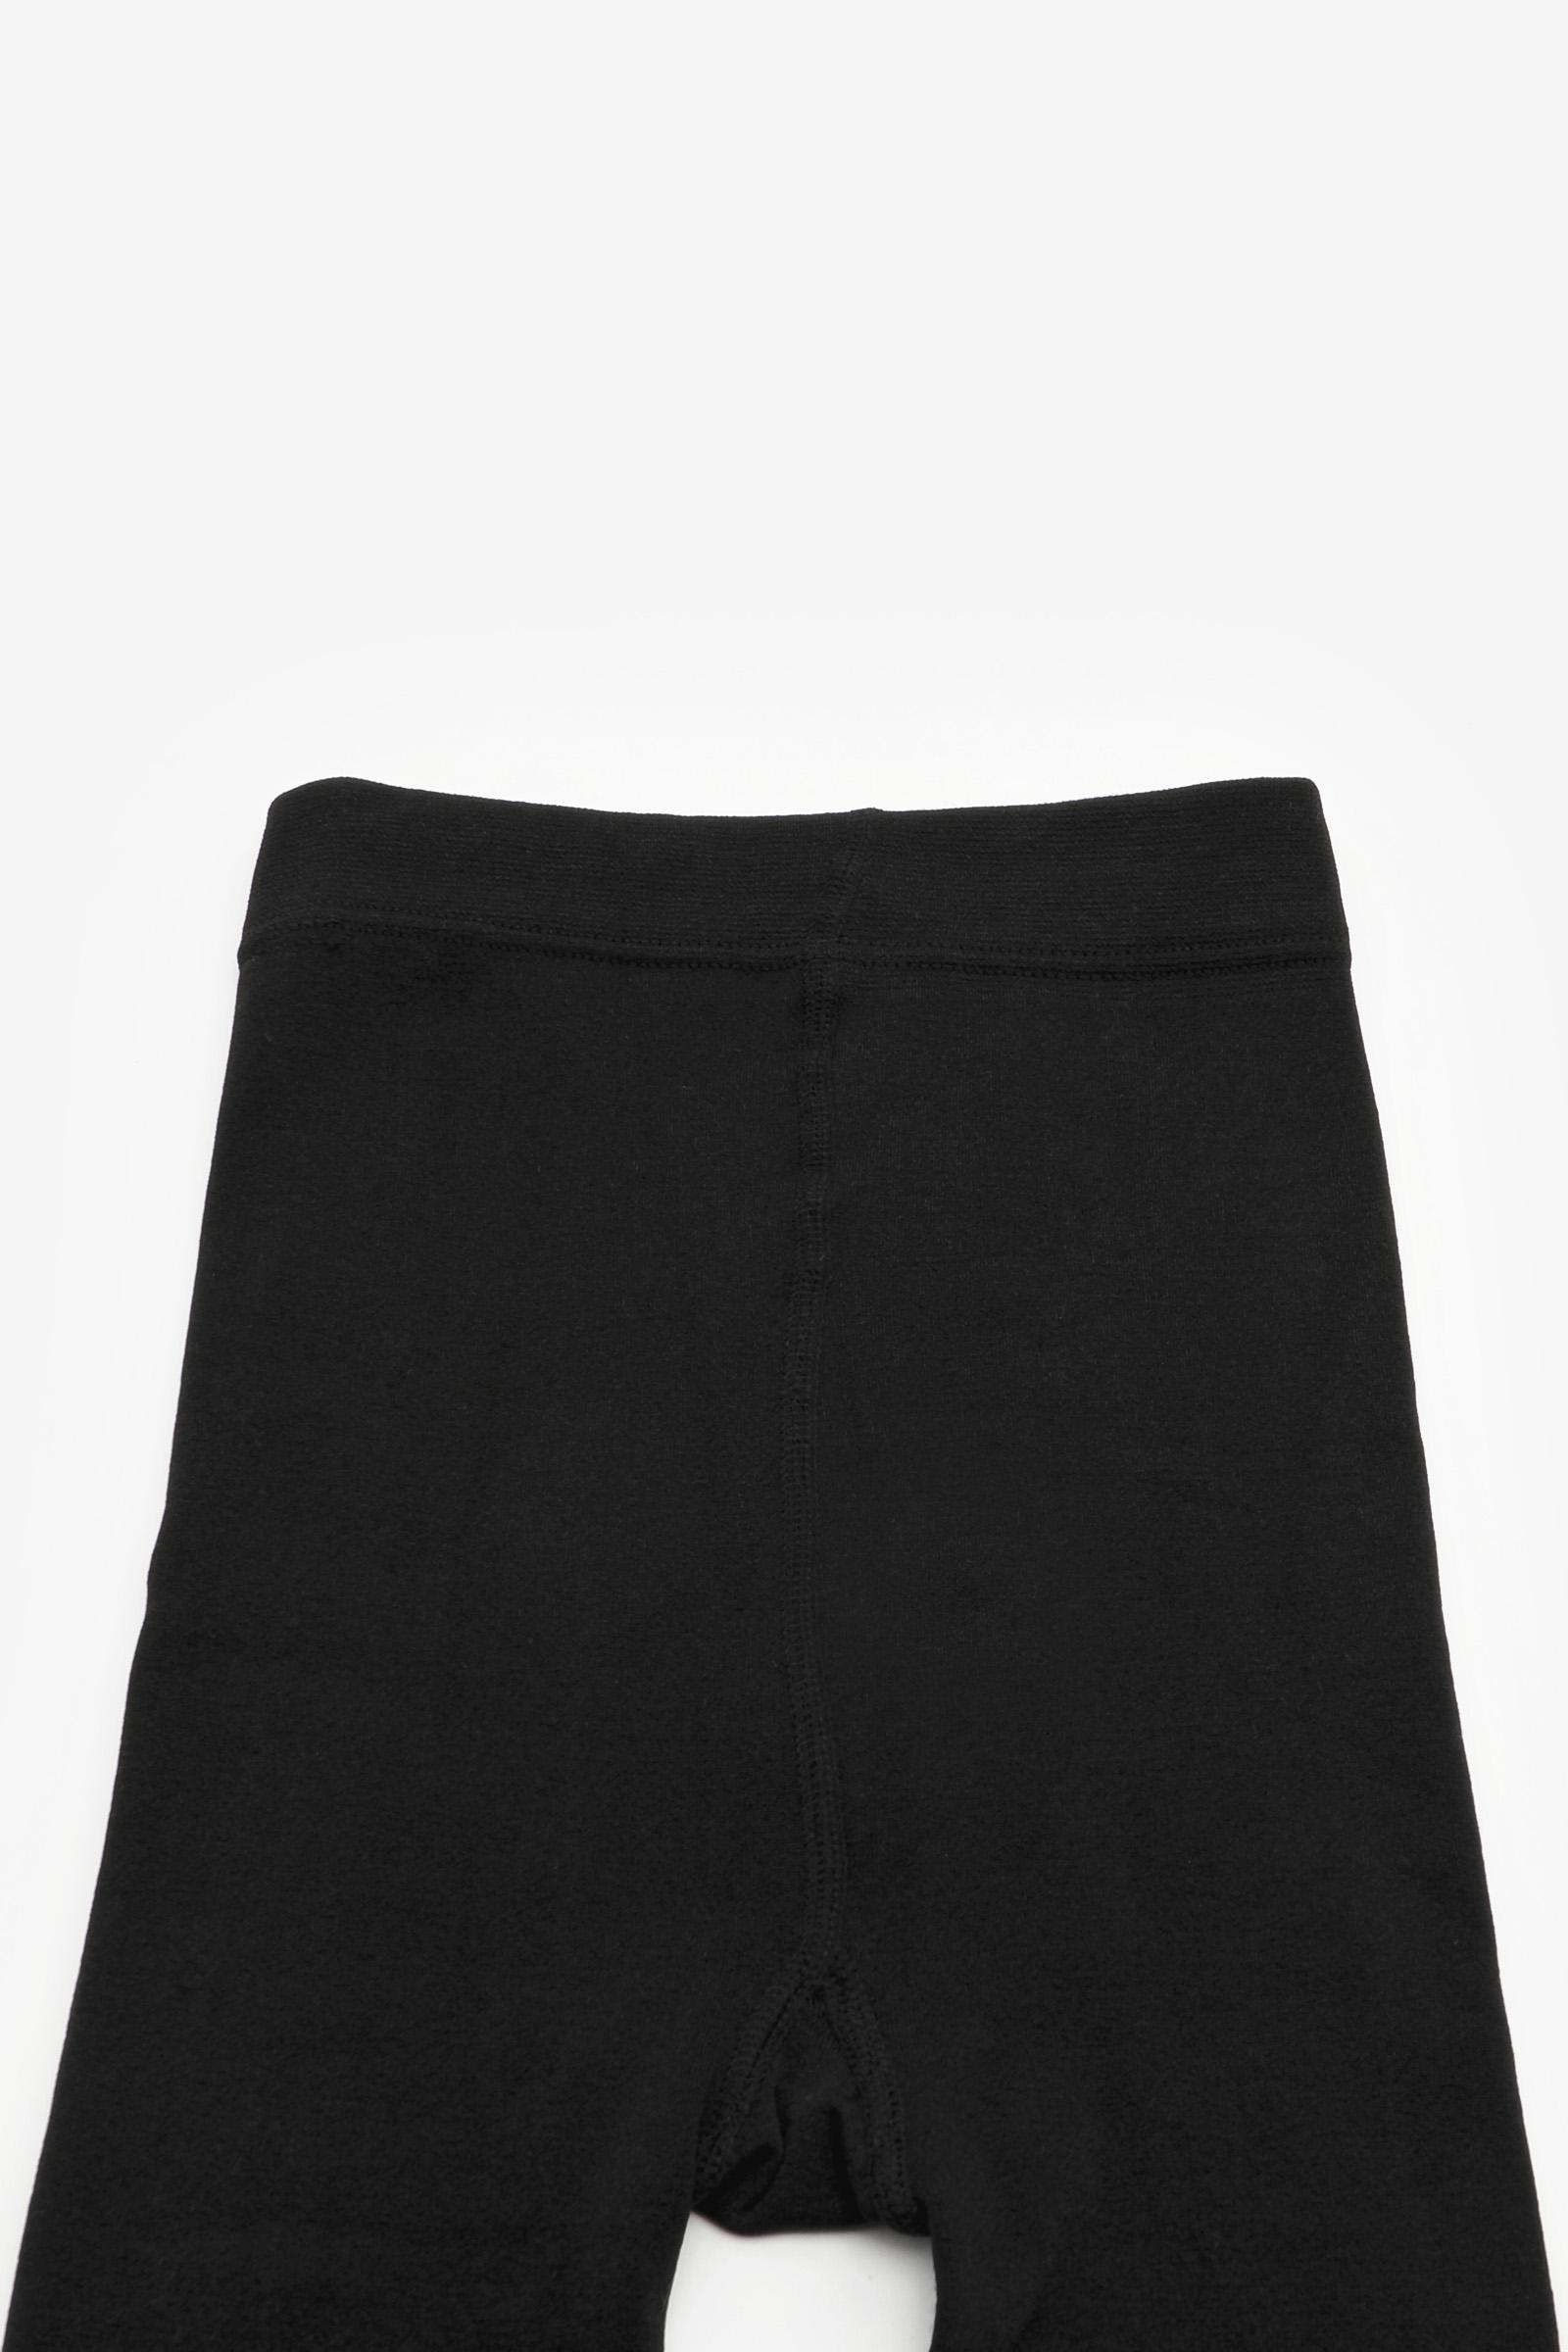 Fleece-lined Tights